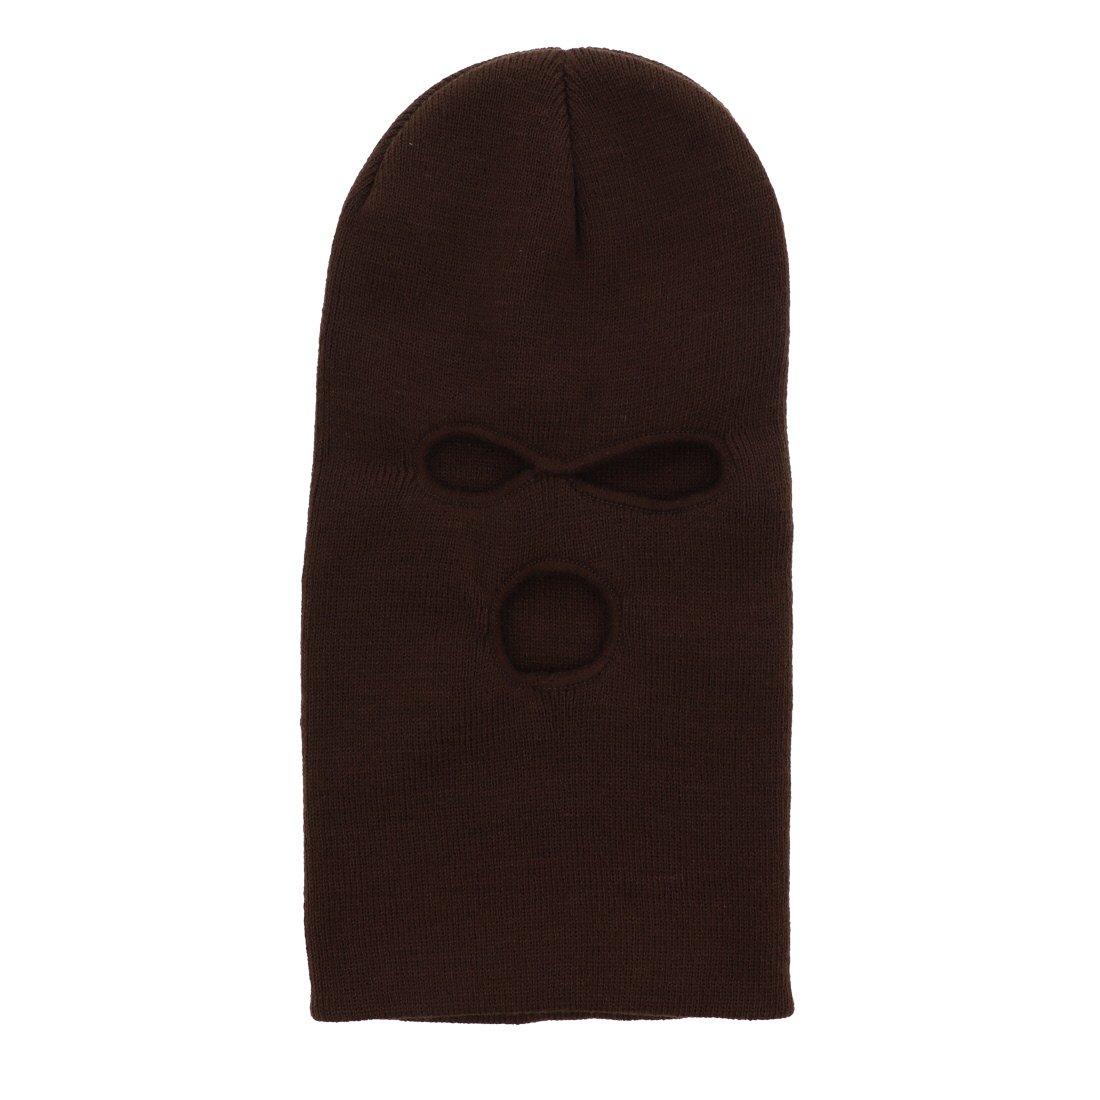 Motique Accessories Unisex Balaclava Face Mask Adult Ski Mask